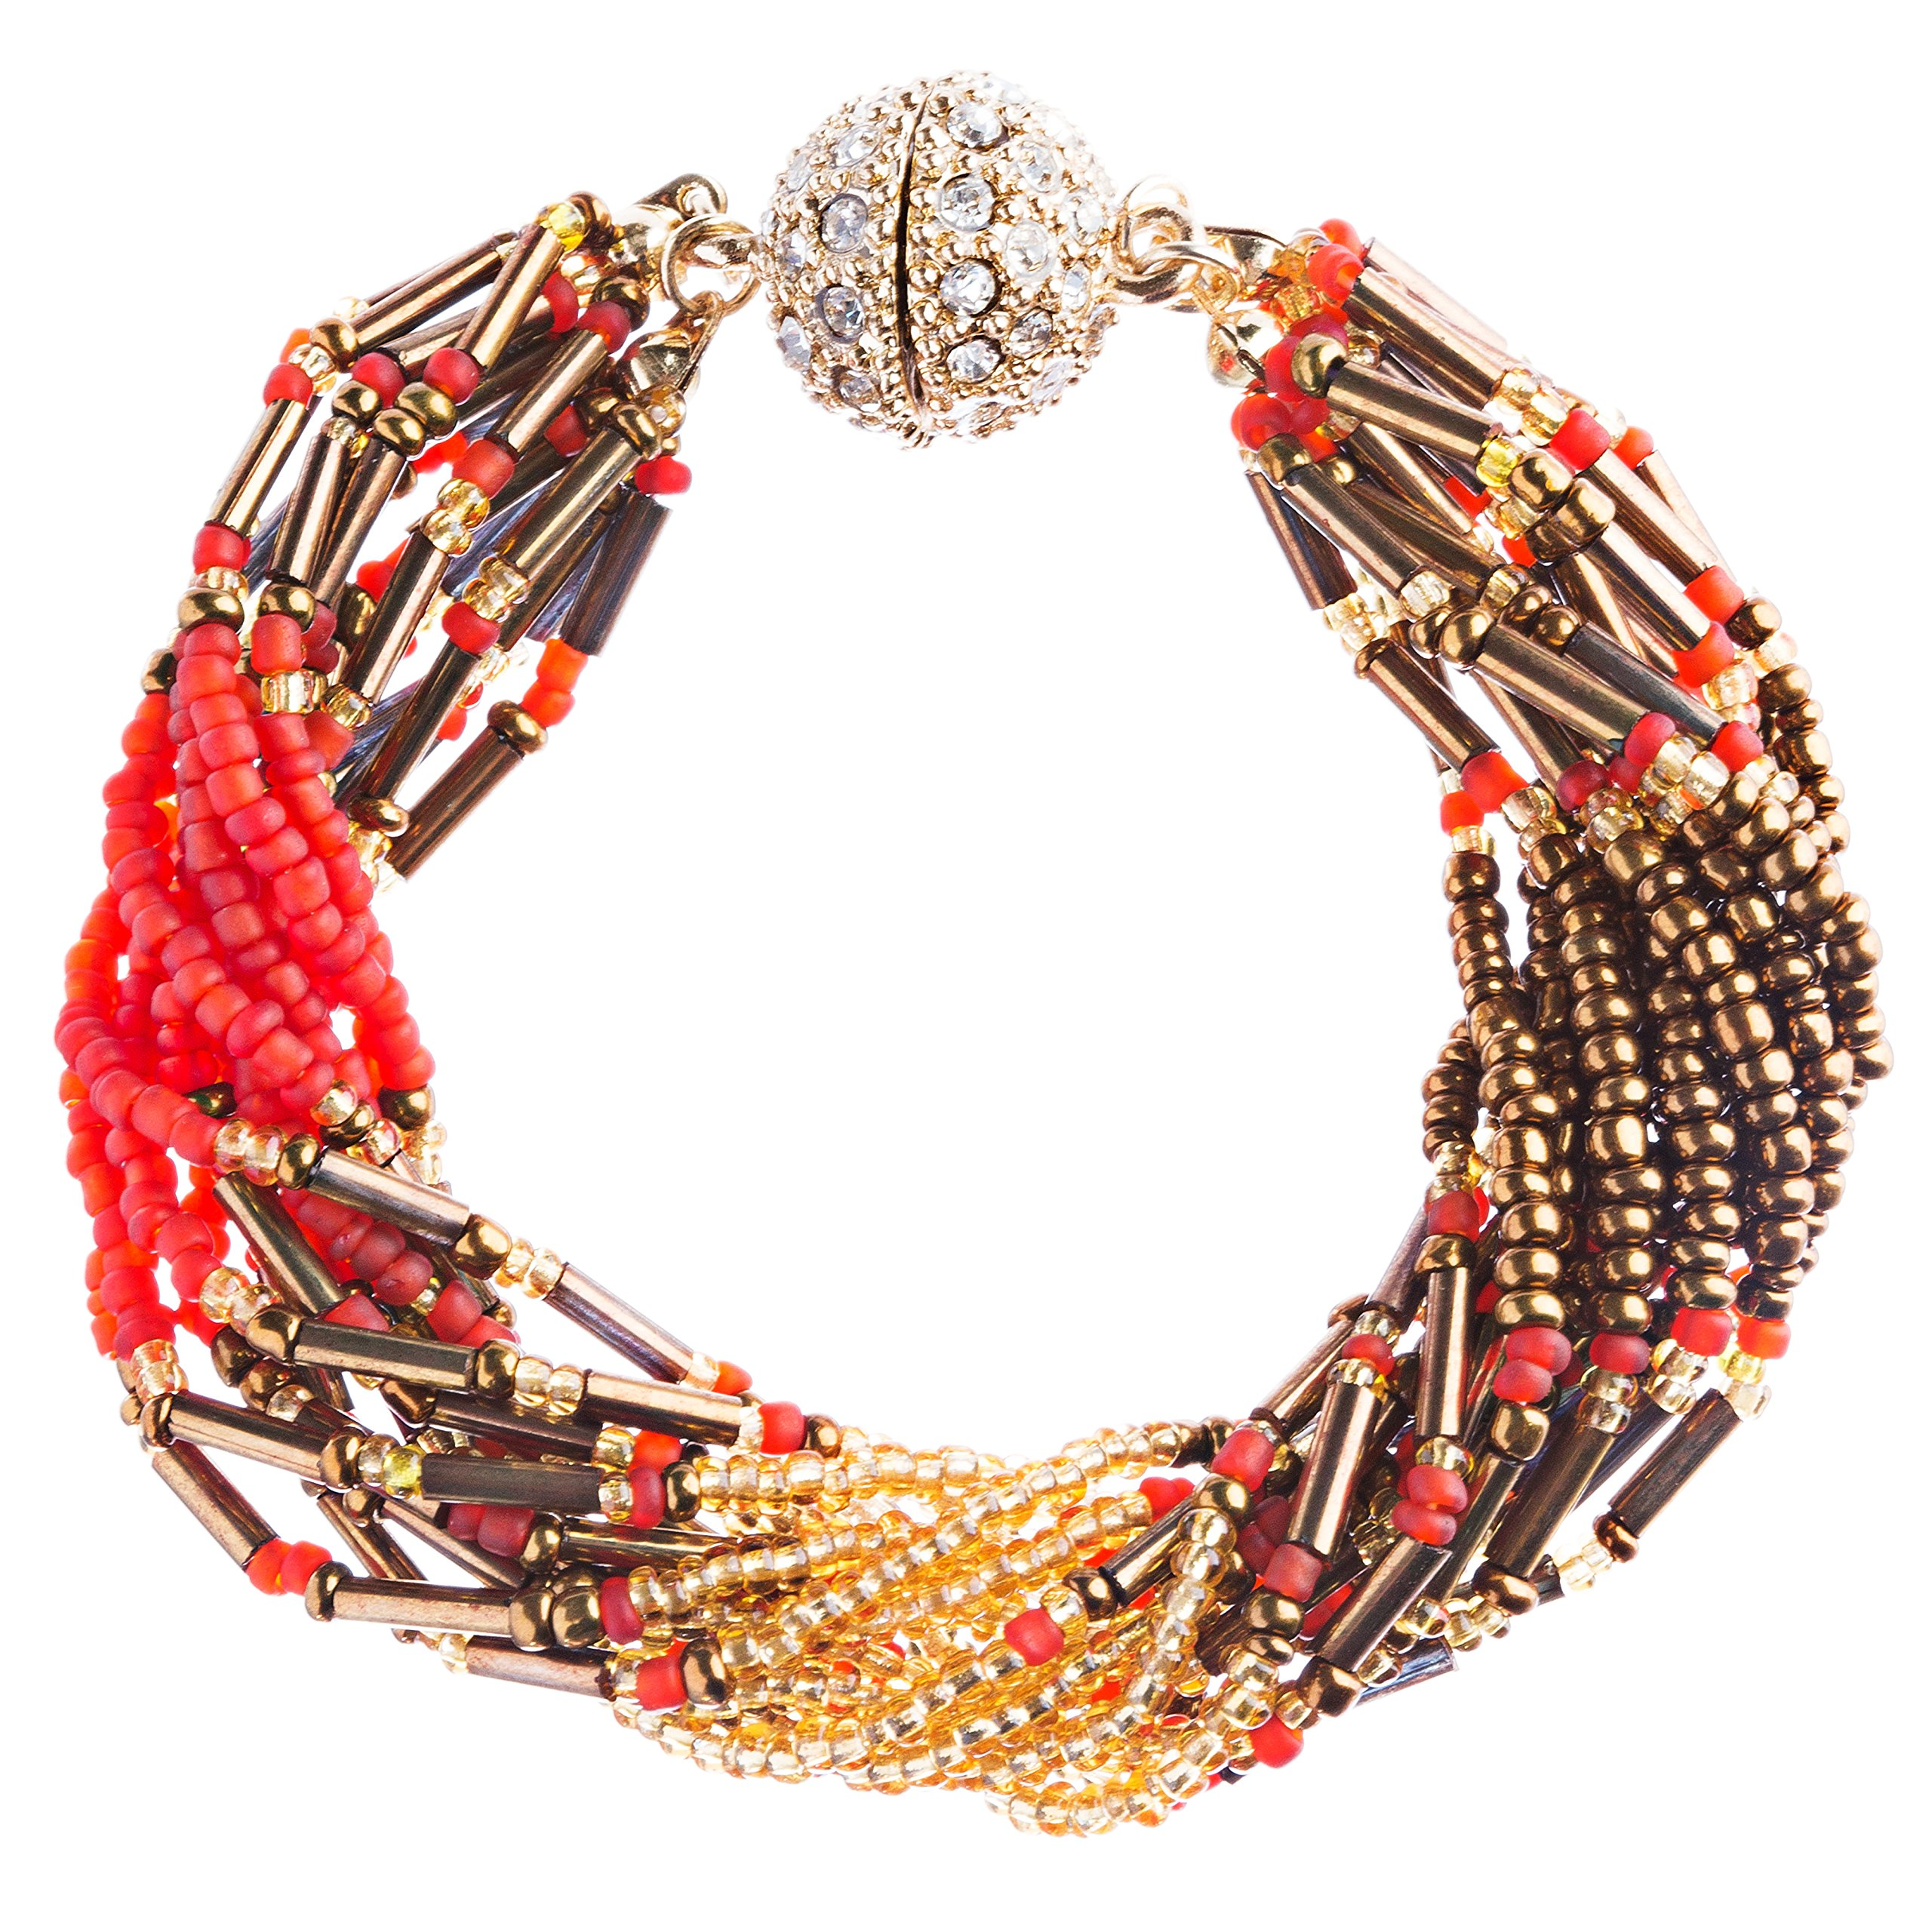 Fashion Multi Strands Beads Rhinestone Magnetic Closure Bracelet B454 Gold Red